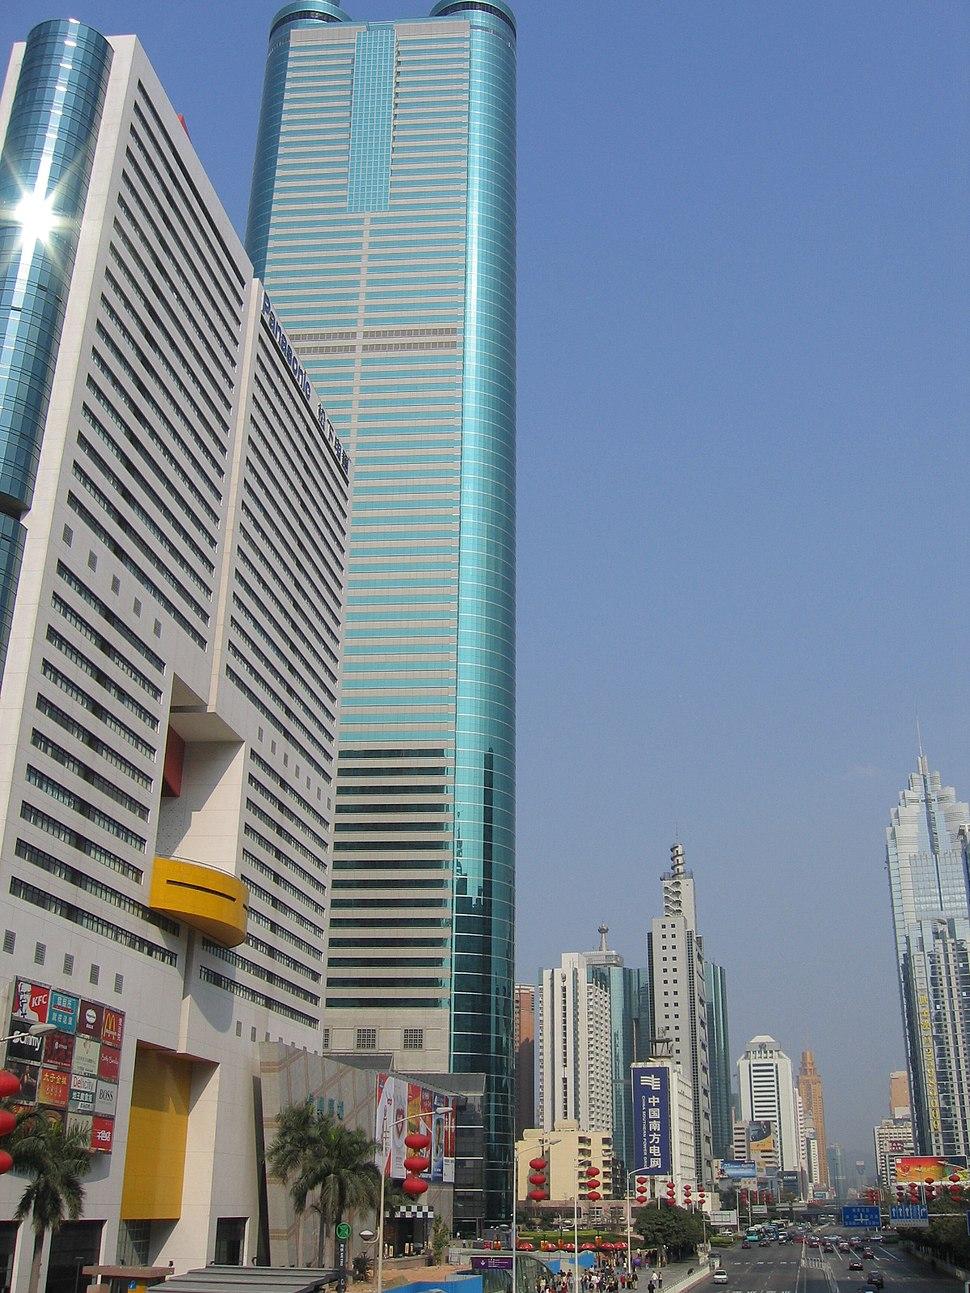 Shenzhendiwang